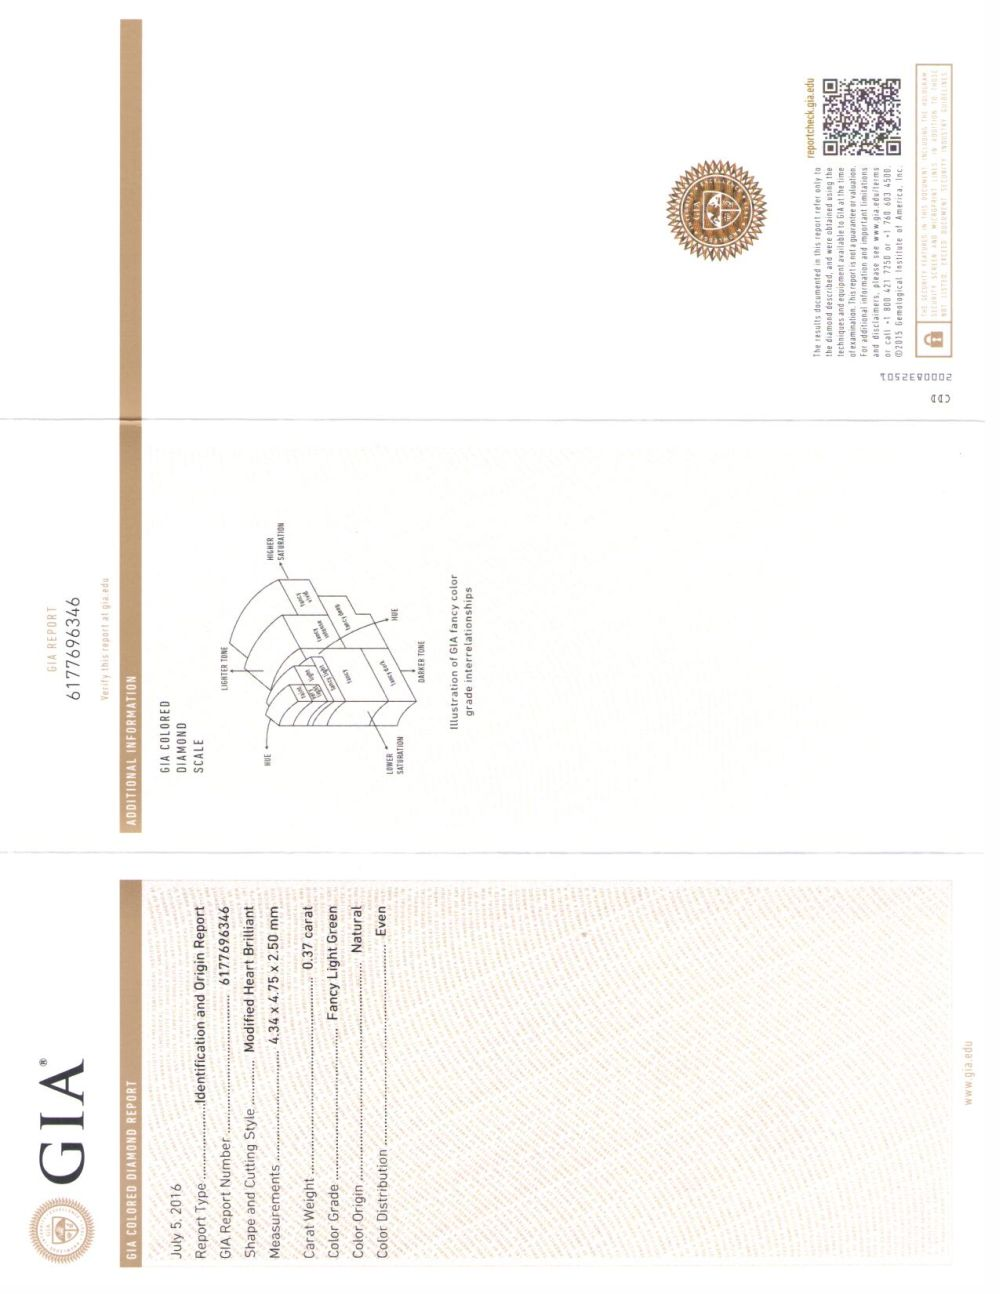 037 carat heart diamond diamond grading report from the gia report nvjuhfo Choice Image